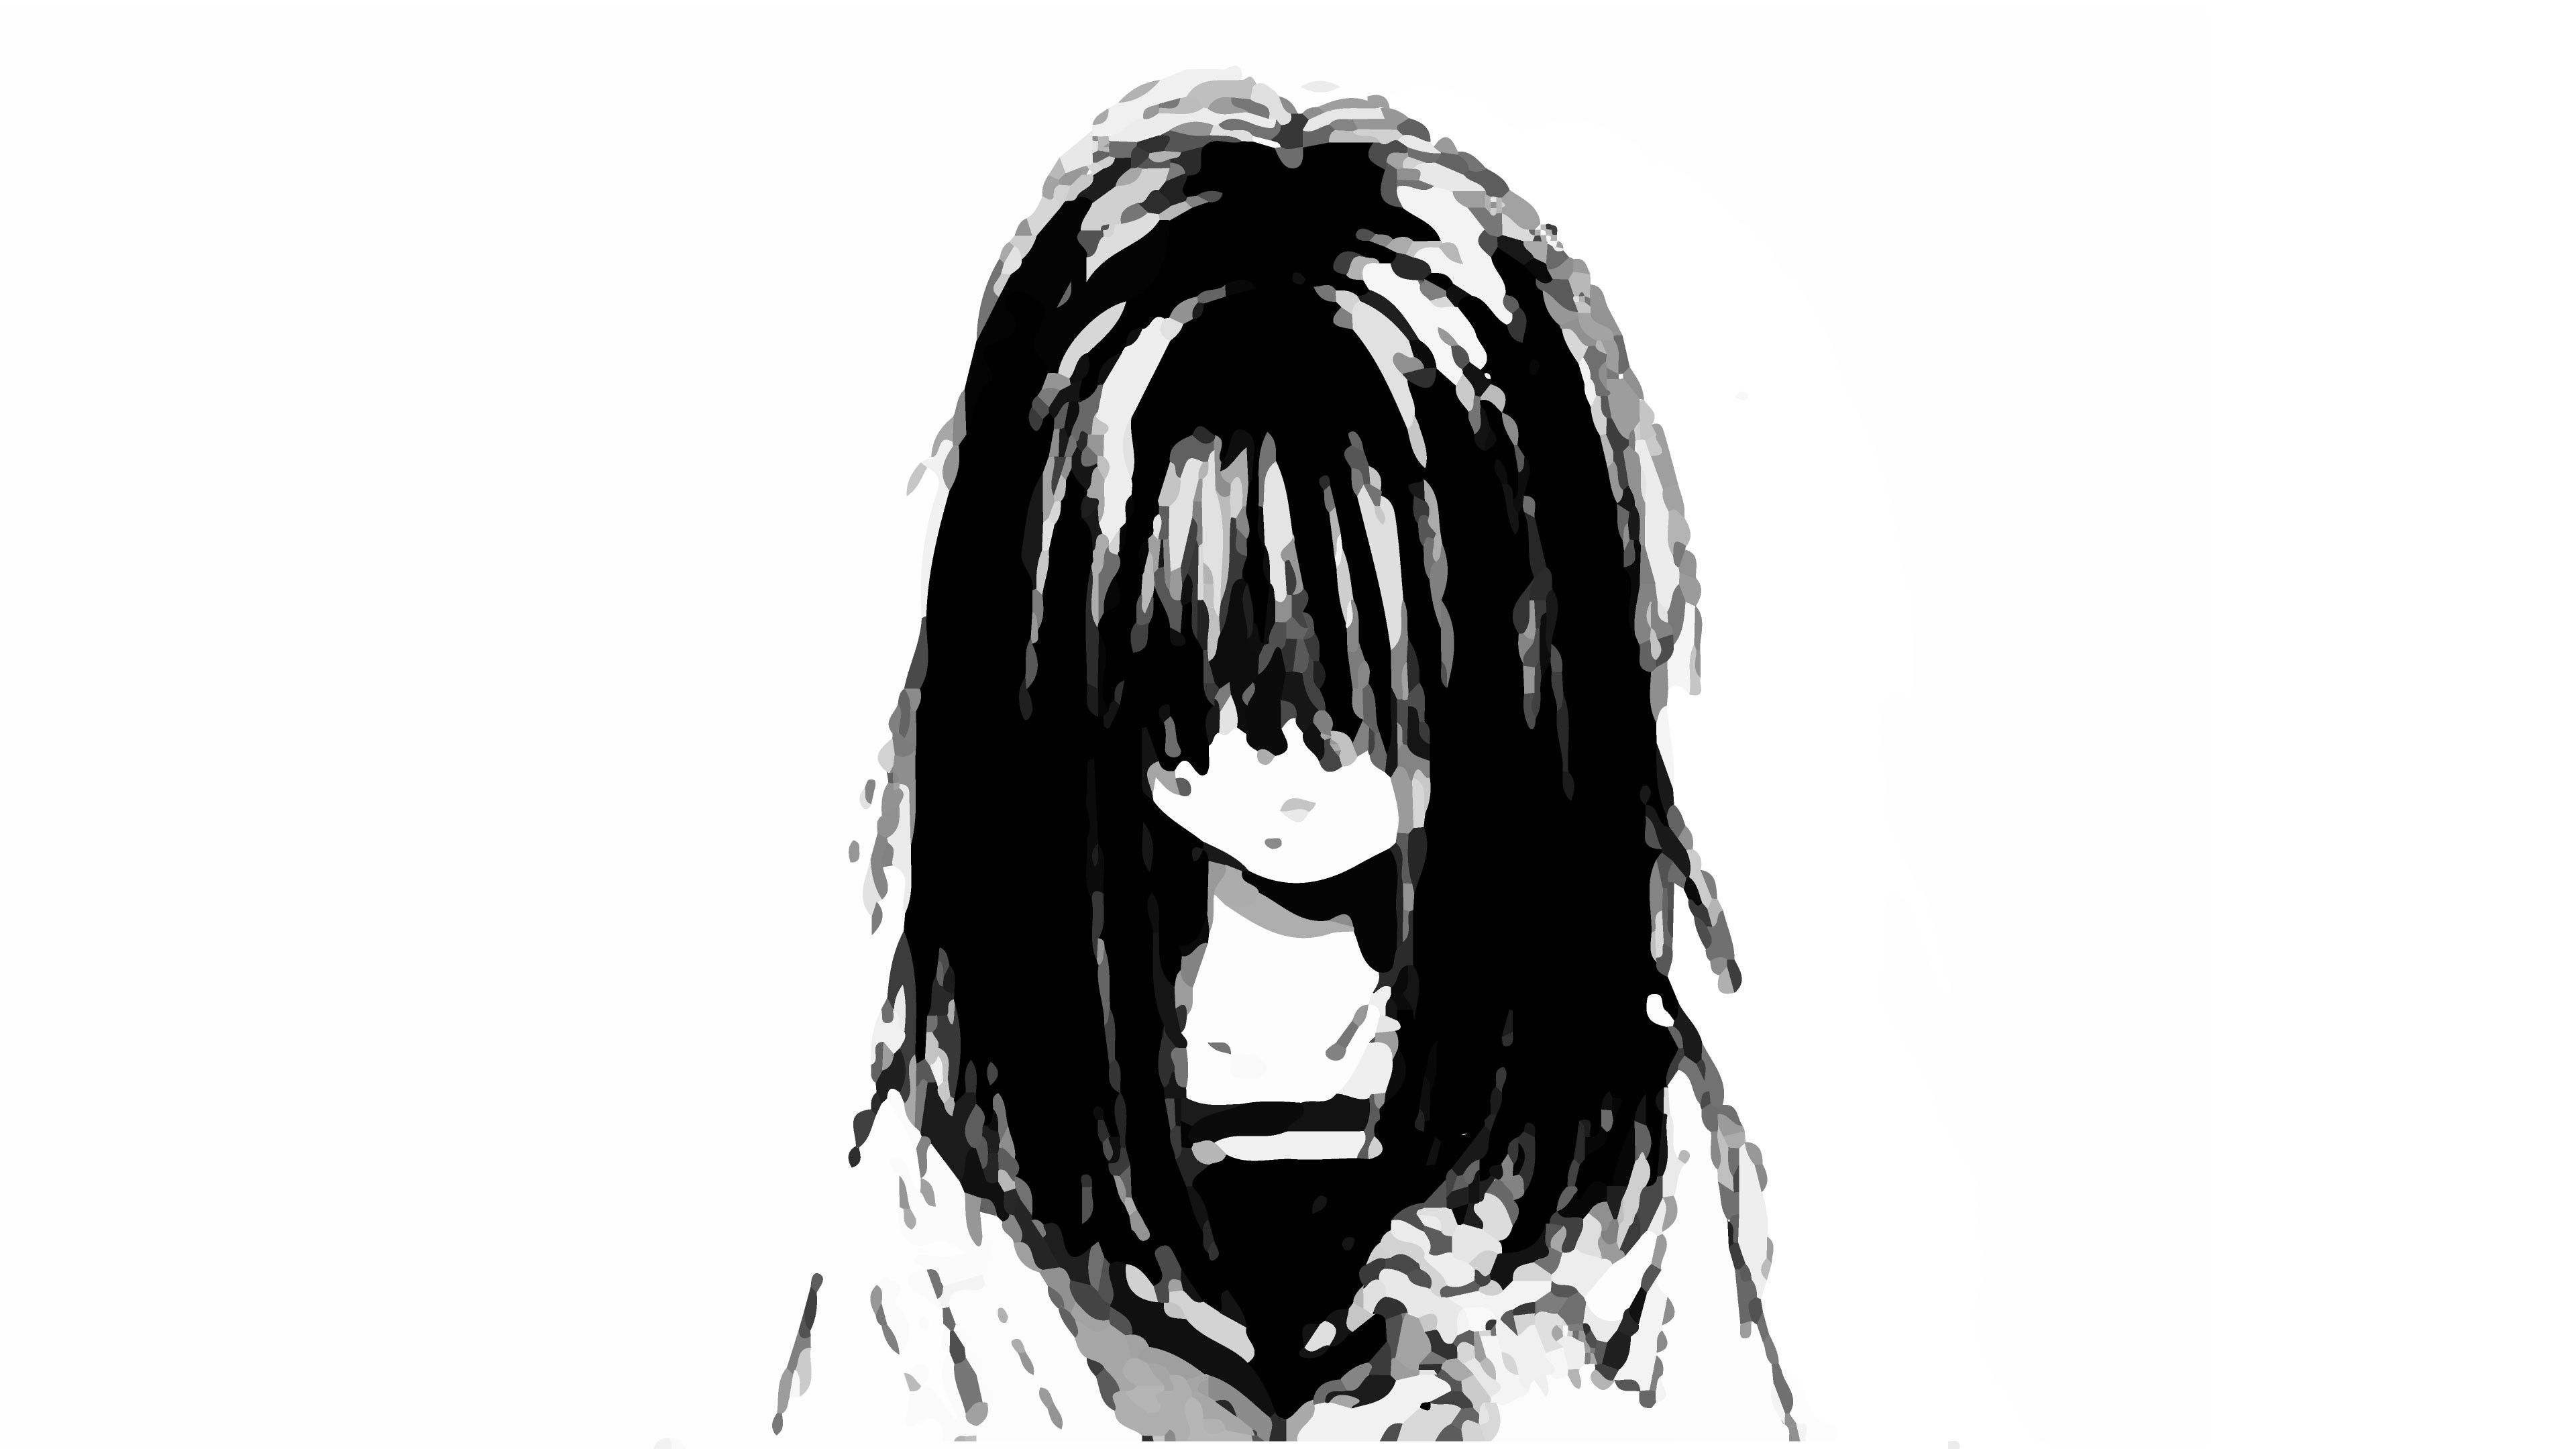 Sad crying anime wallpapers top free sad crying anime - Depressing anime pictures ...